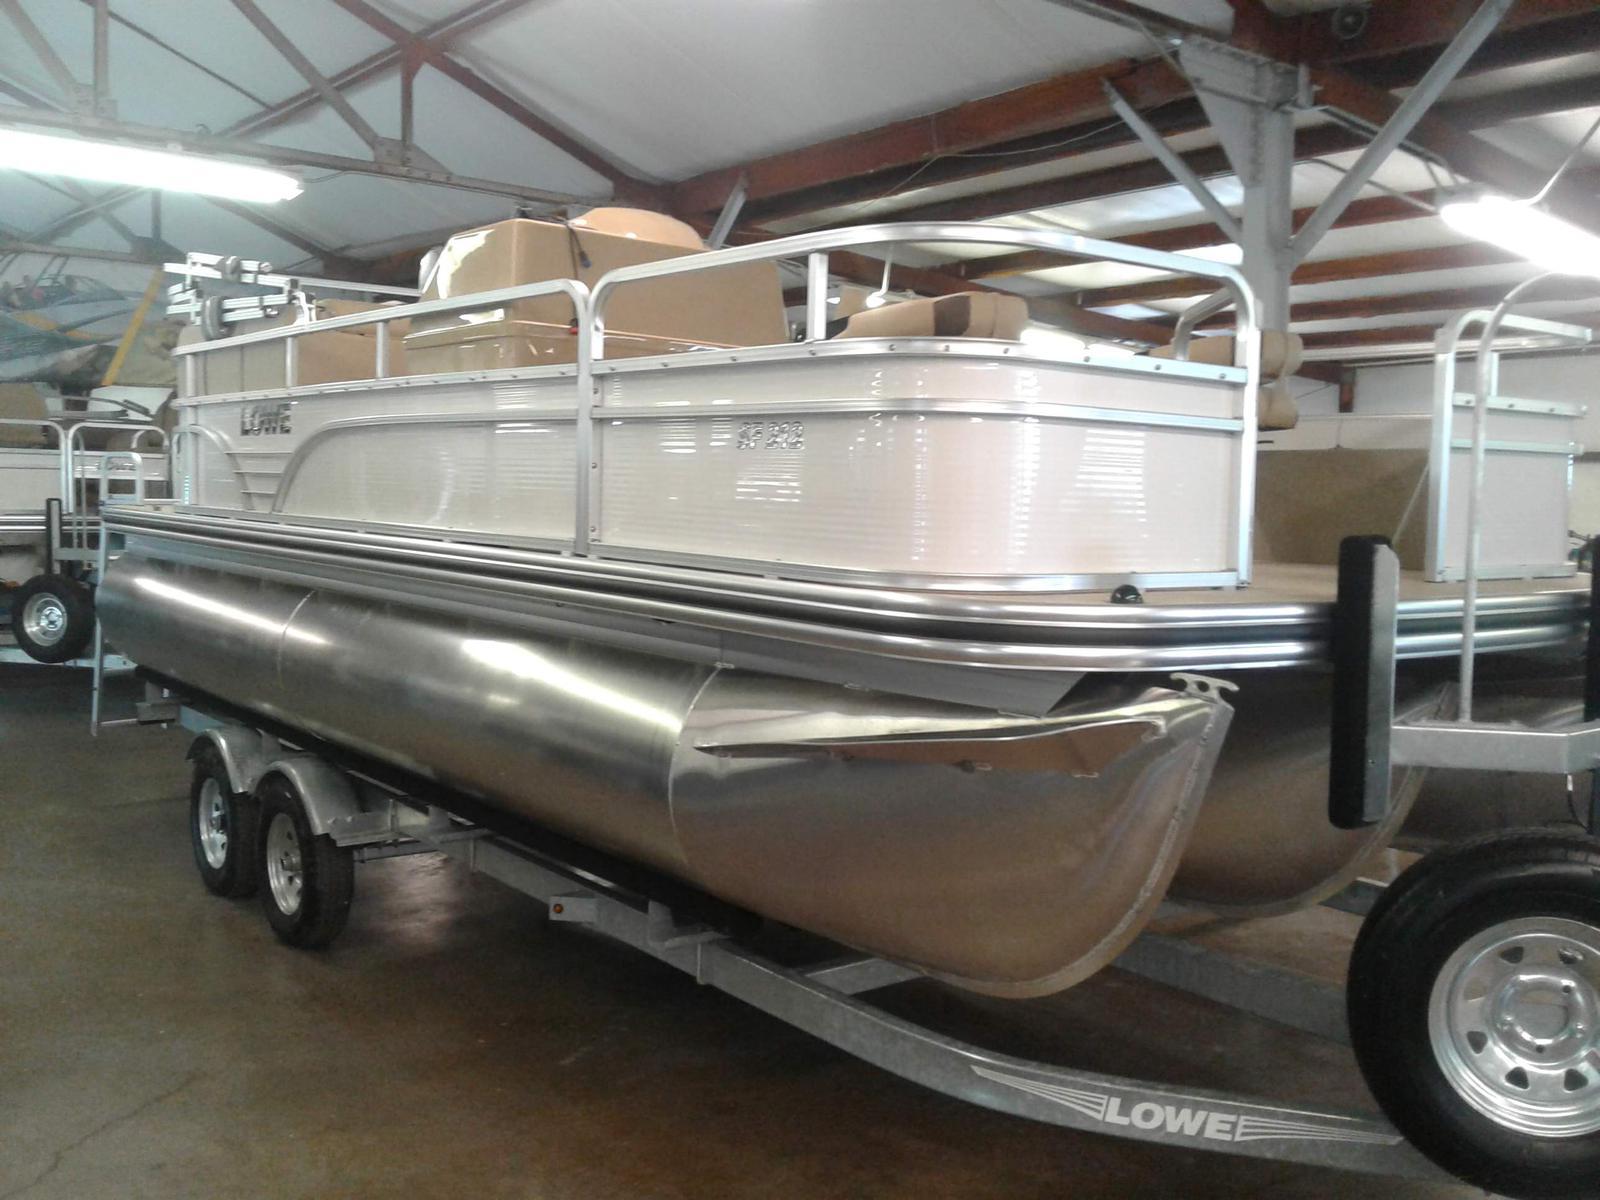 Lowe SF212W Tri-Toon